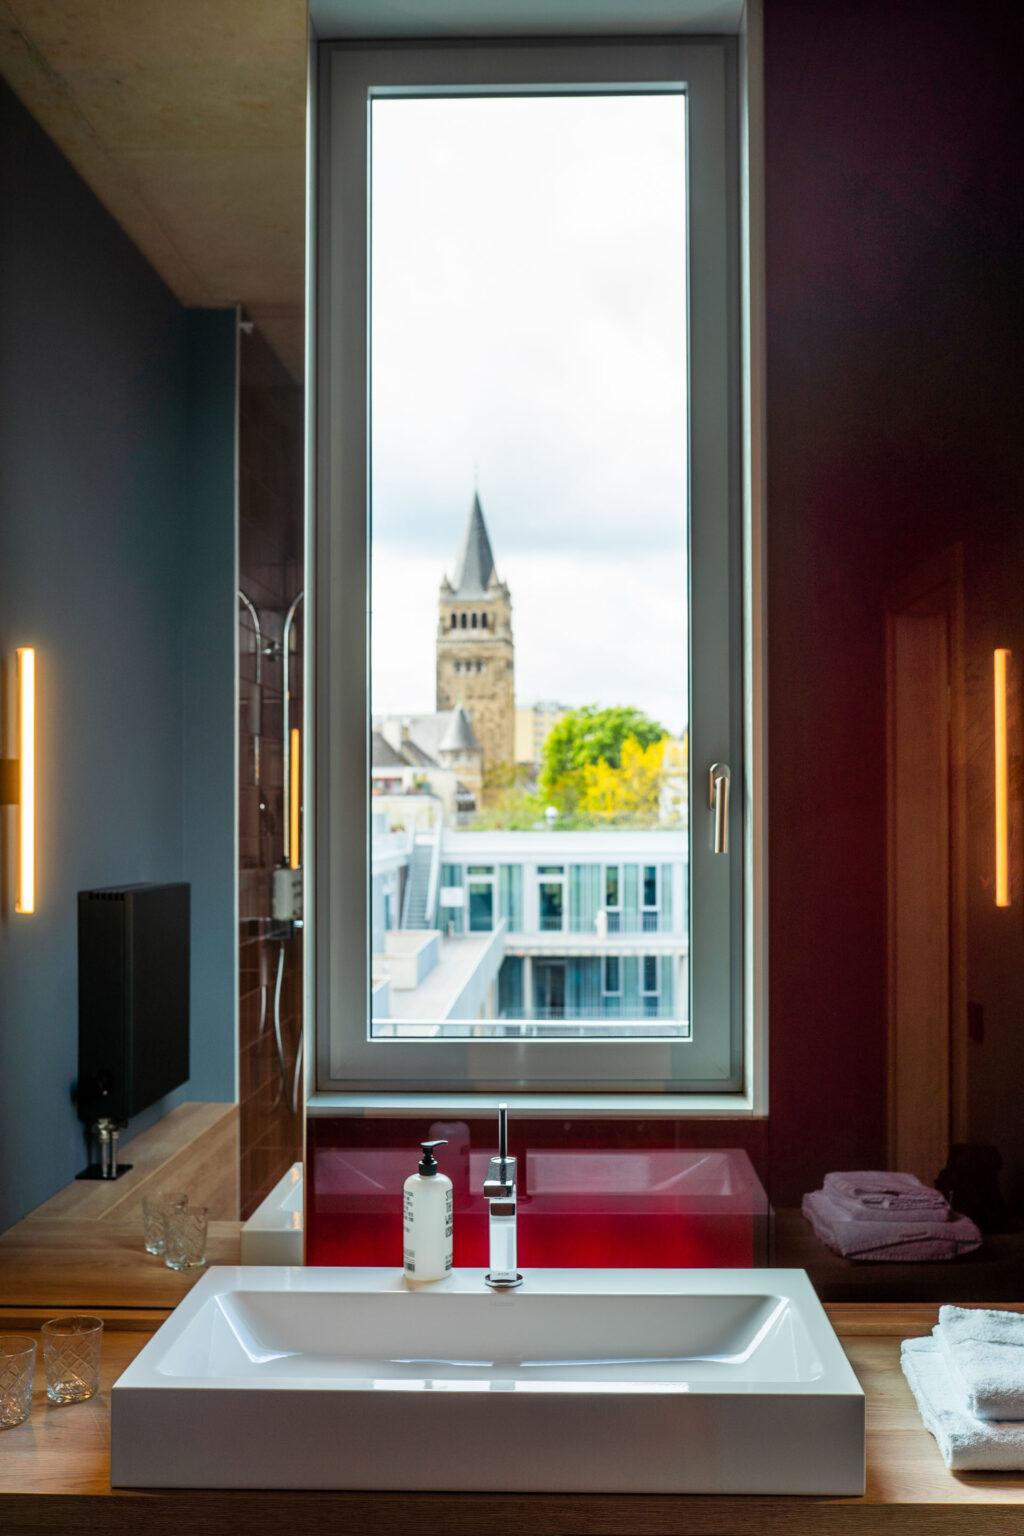 Koncept Hotel Josefine - Hotel in Köln-Nippes